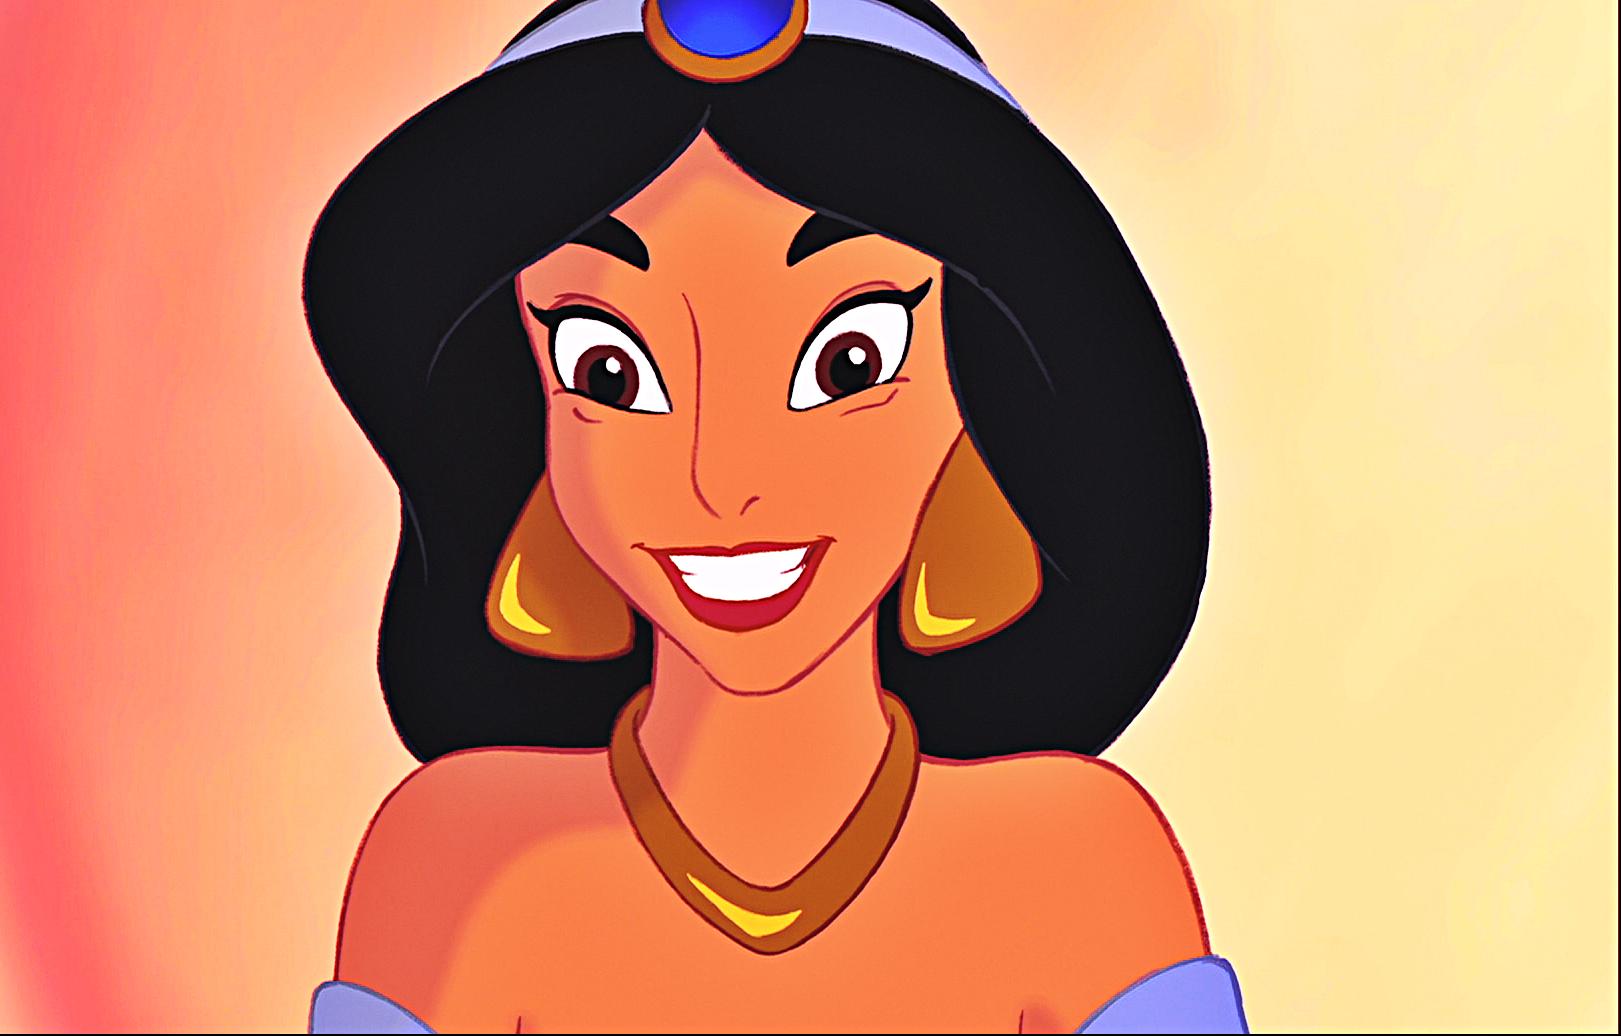 Walt Disney - Princess hasmin